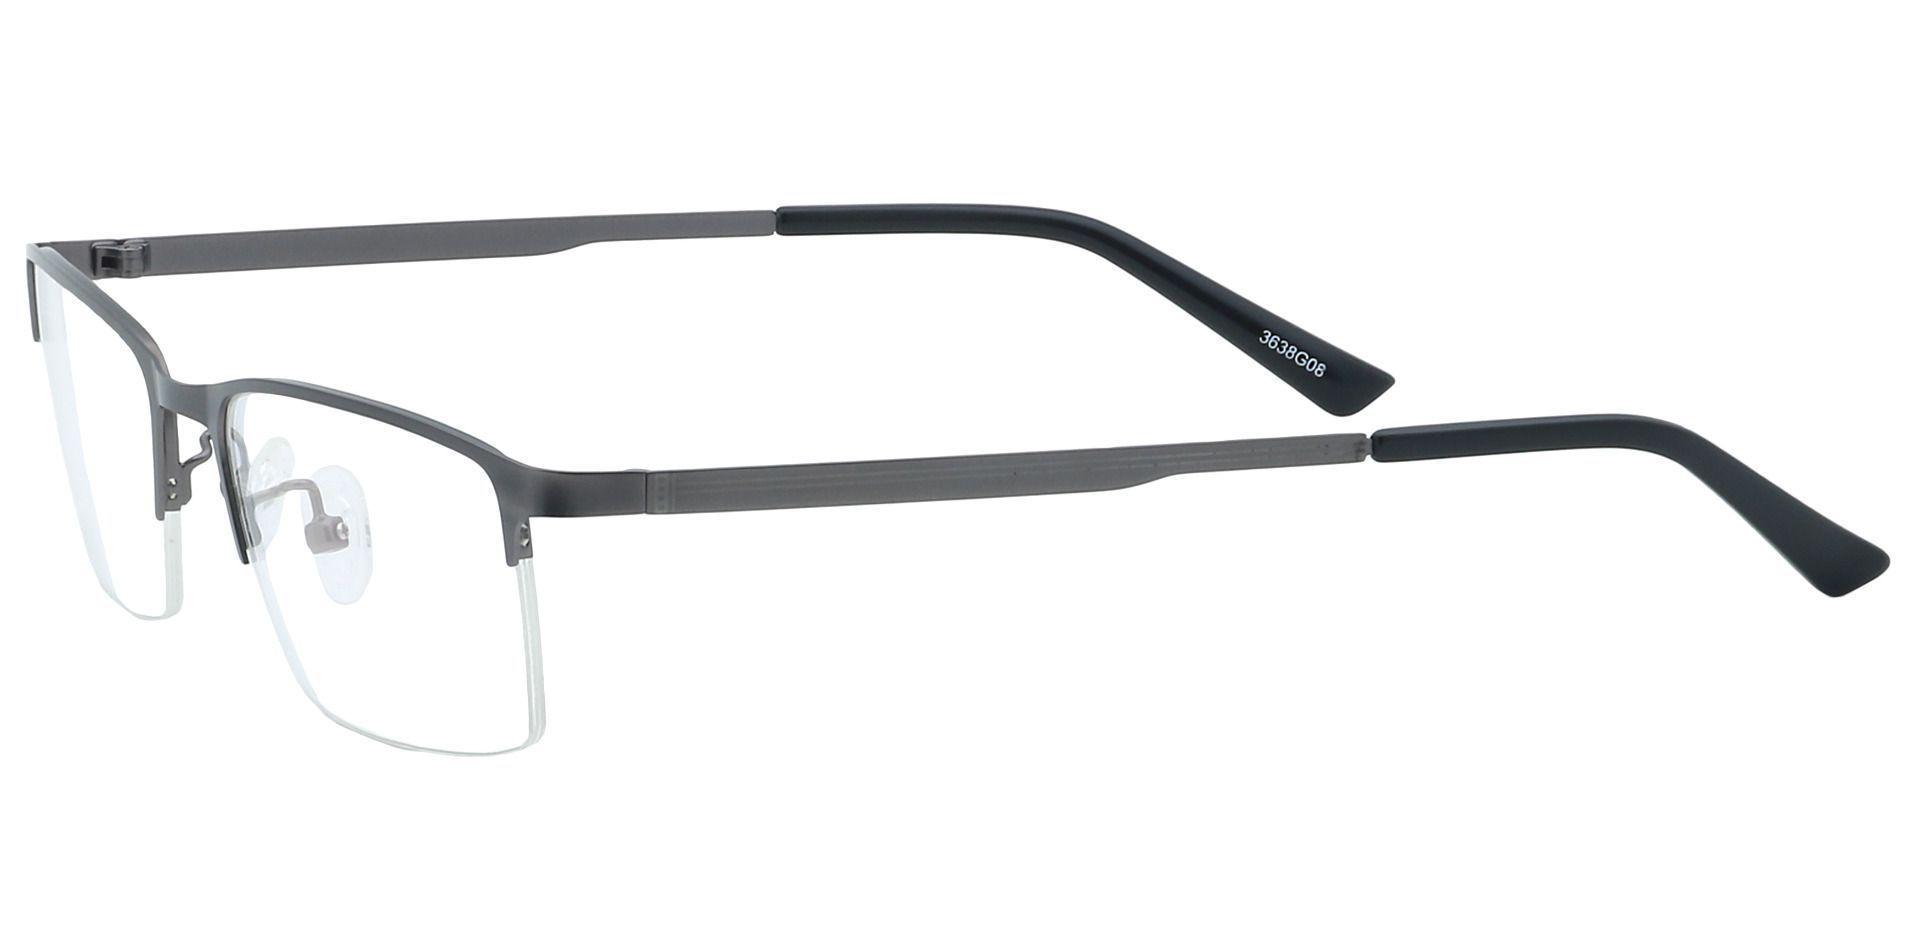 Rue Rectangle Reading Glasses - Gray